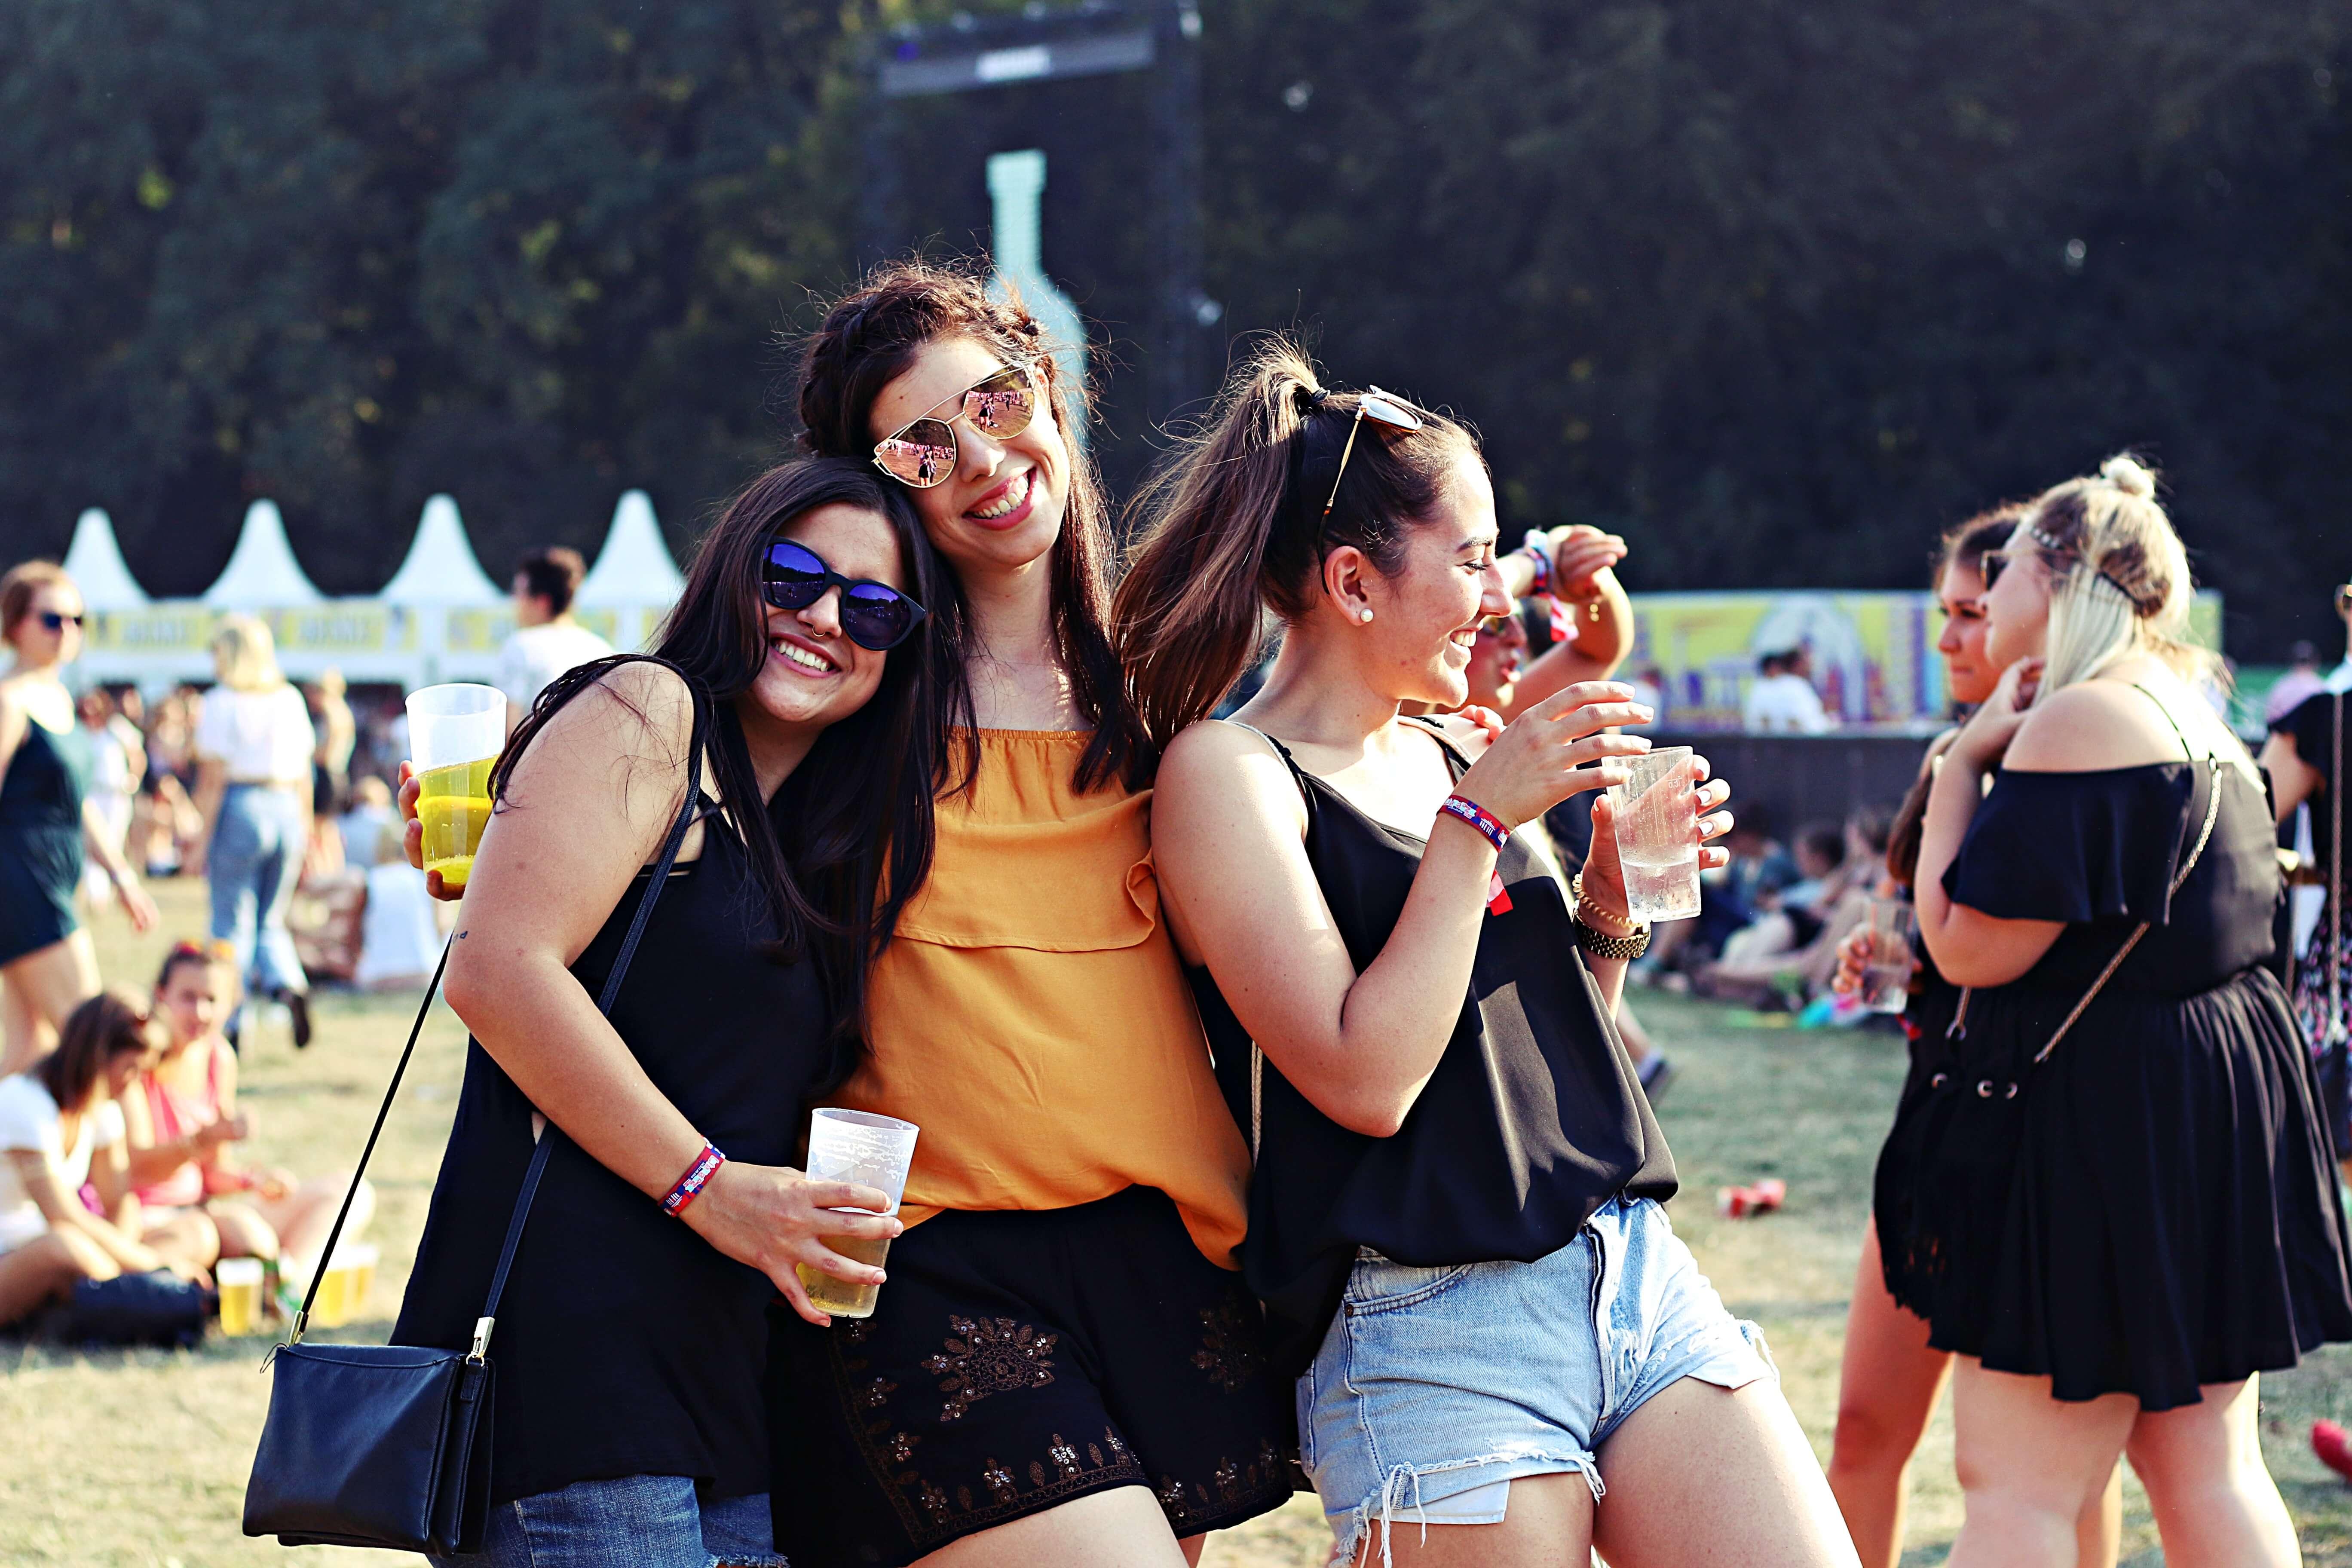 sommer-girls-festival-berlin-lollapalooza